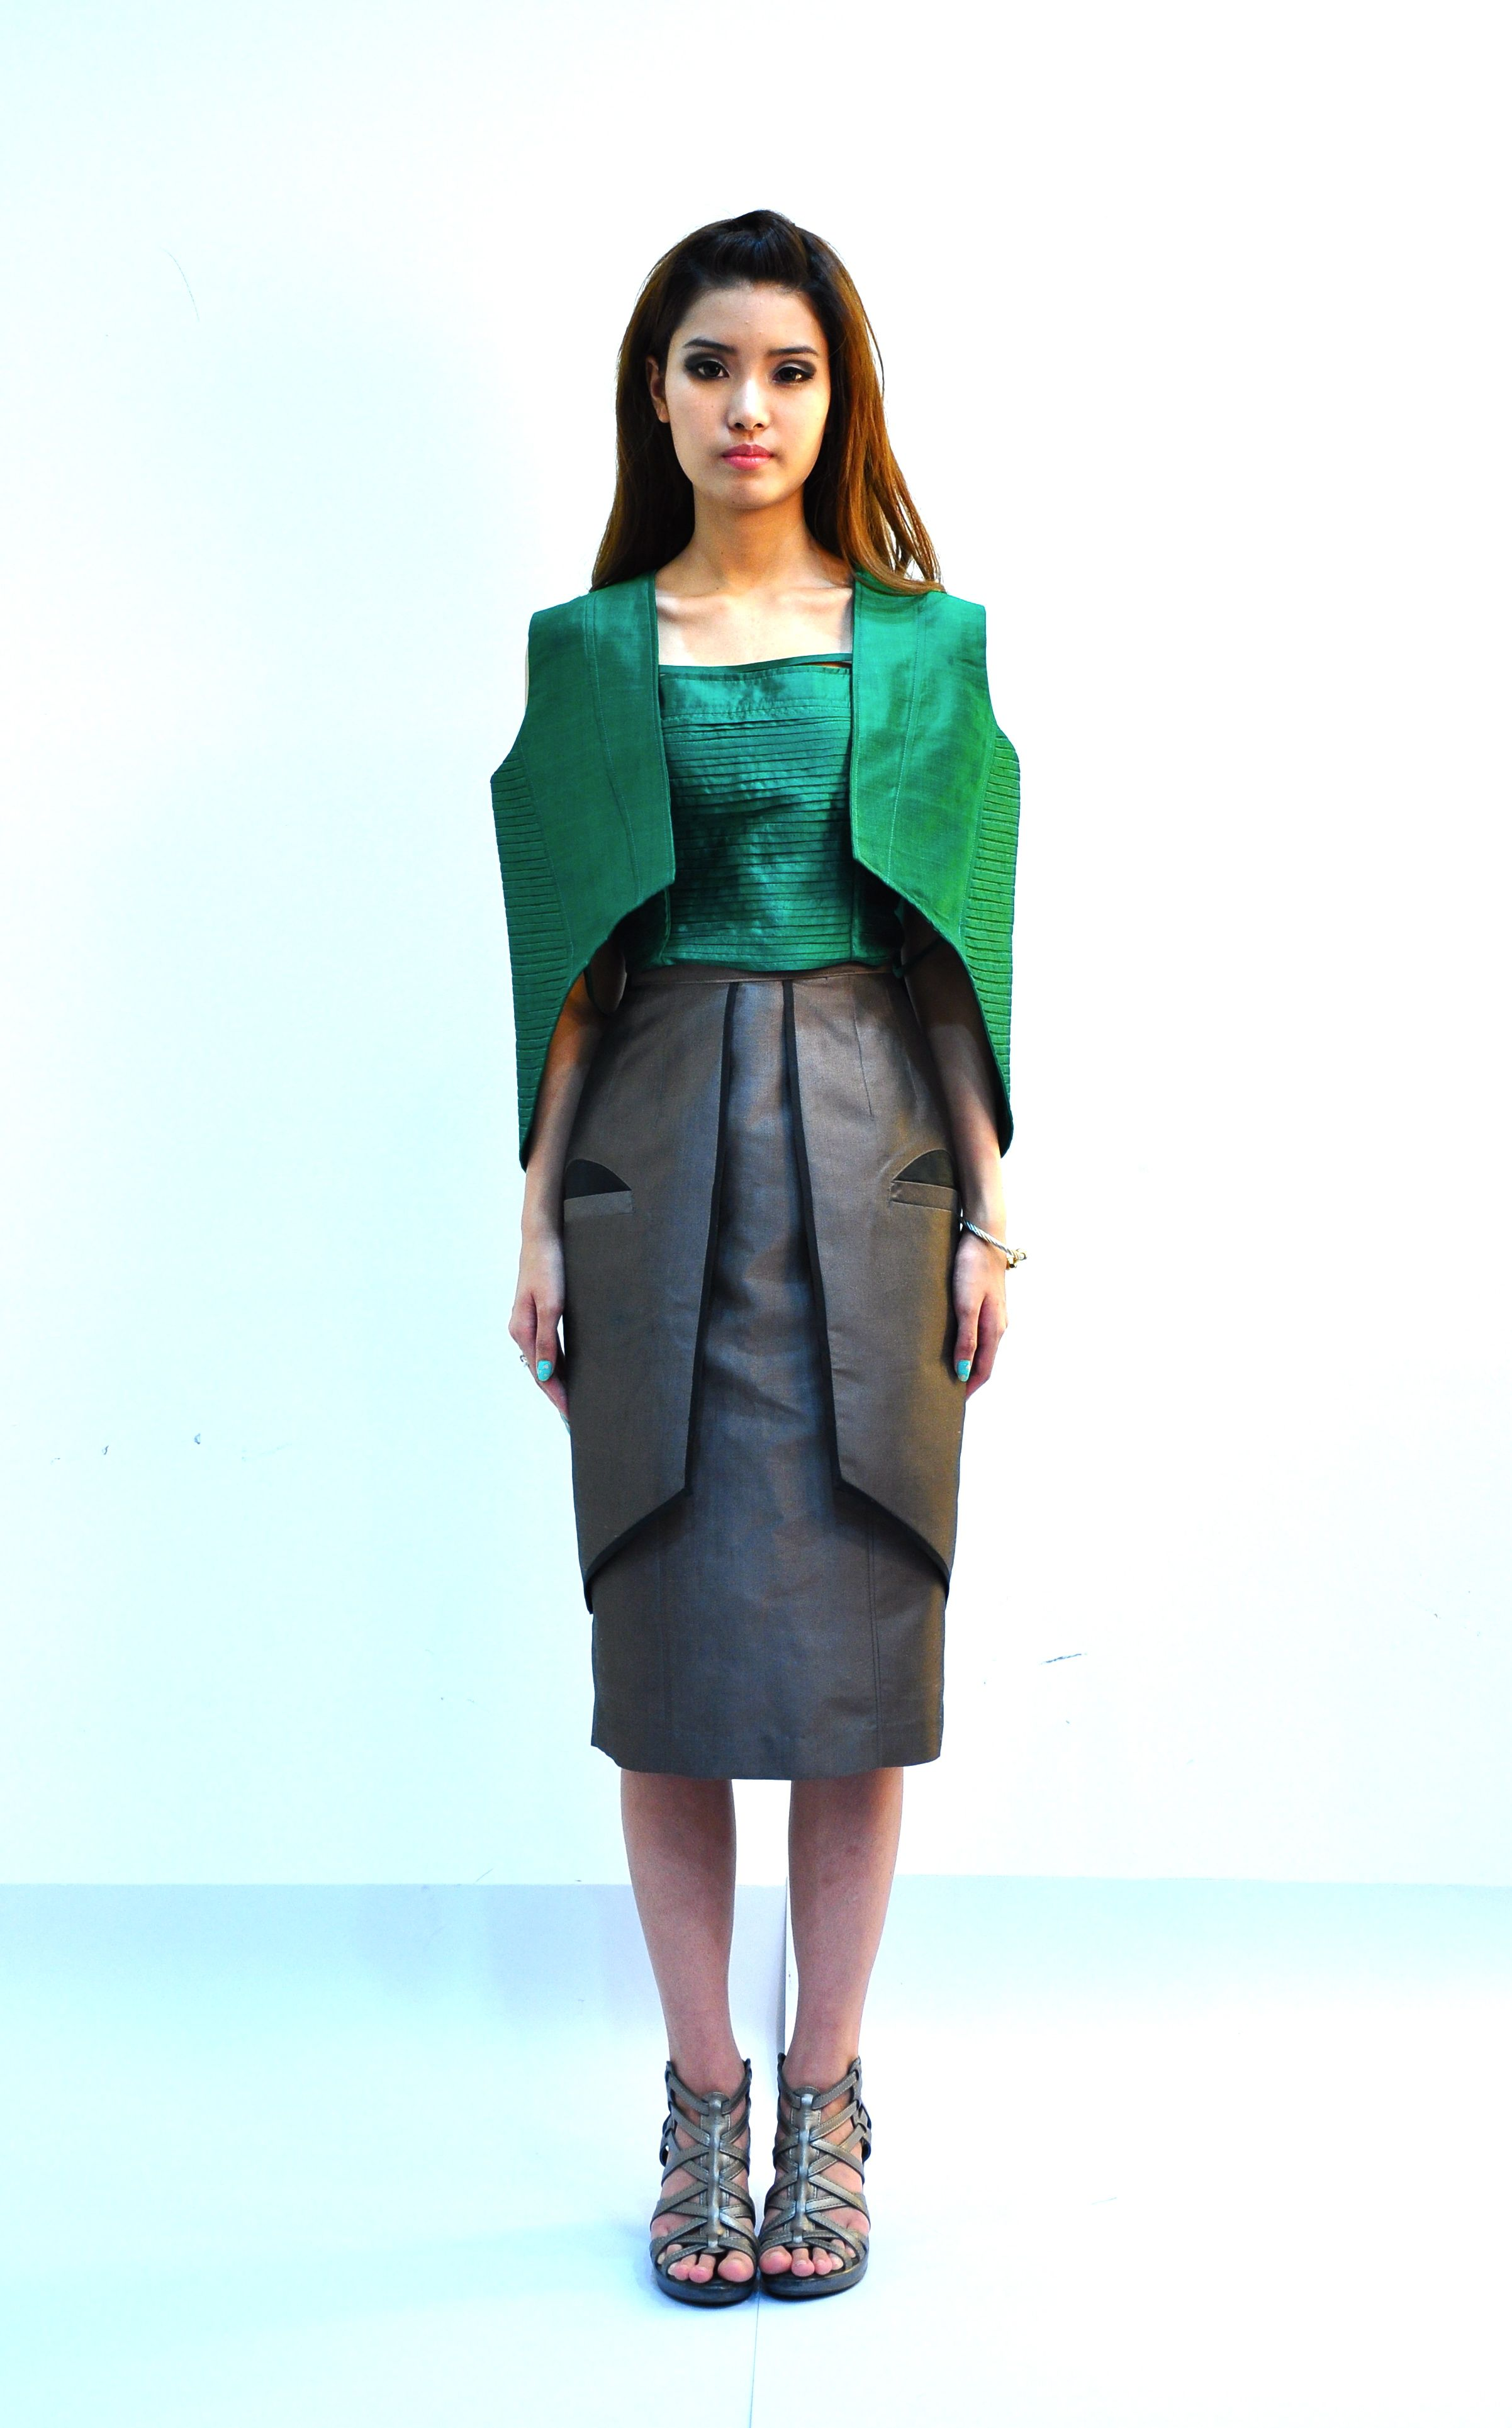 Egyptian Fashion Clothing